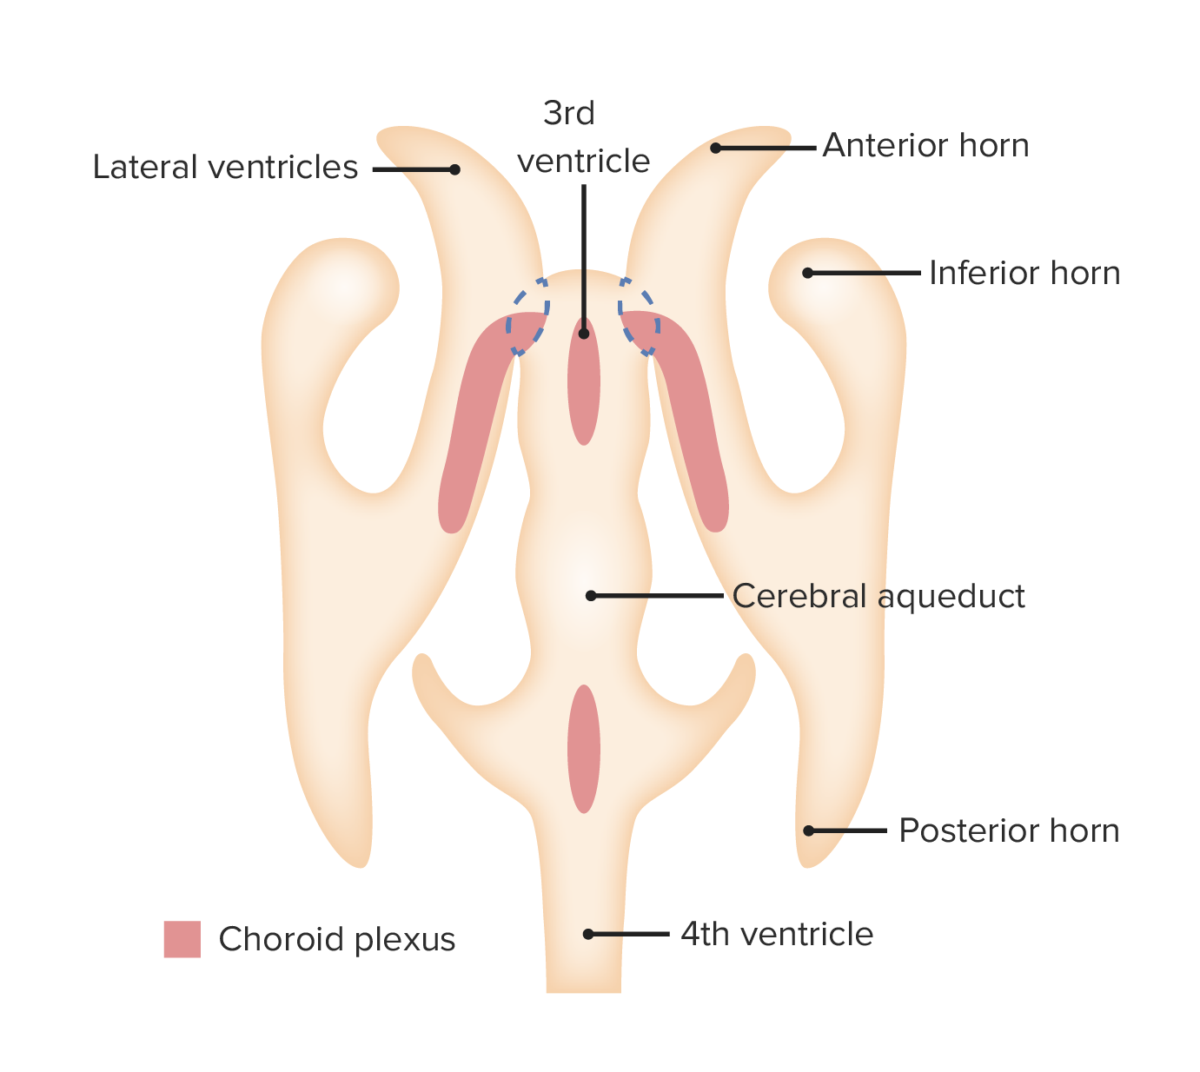 Choroid plexus development